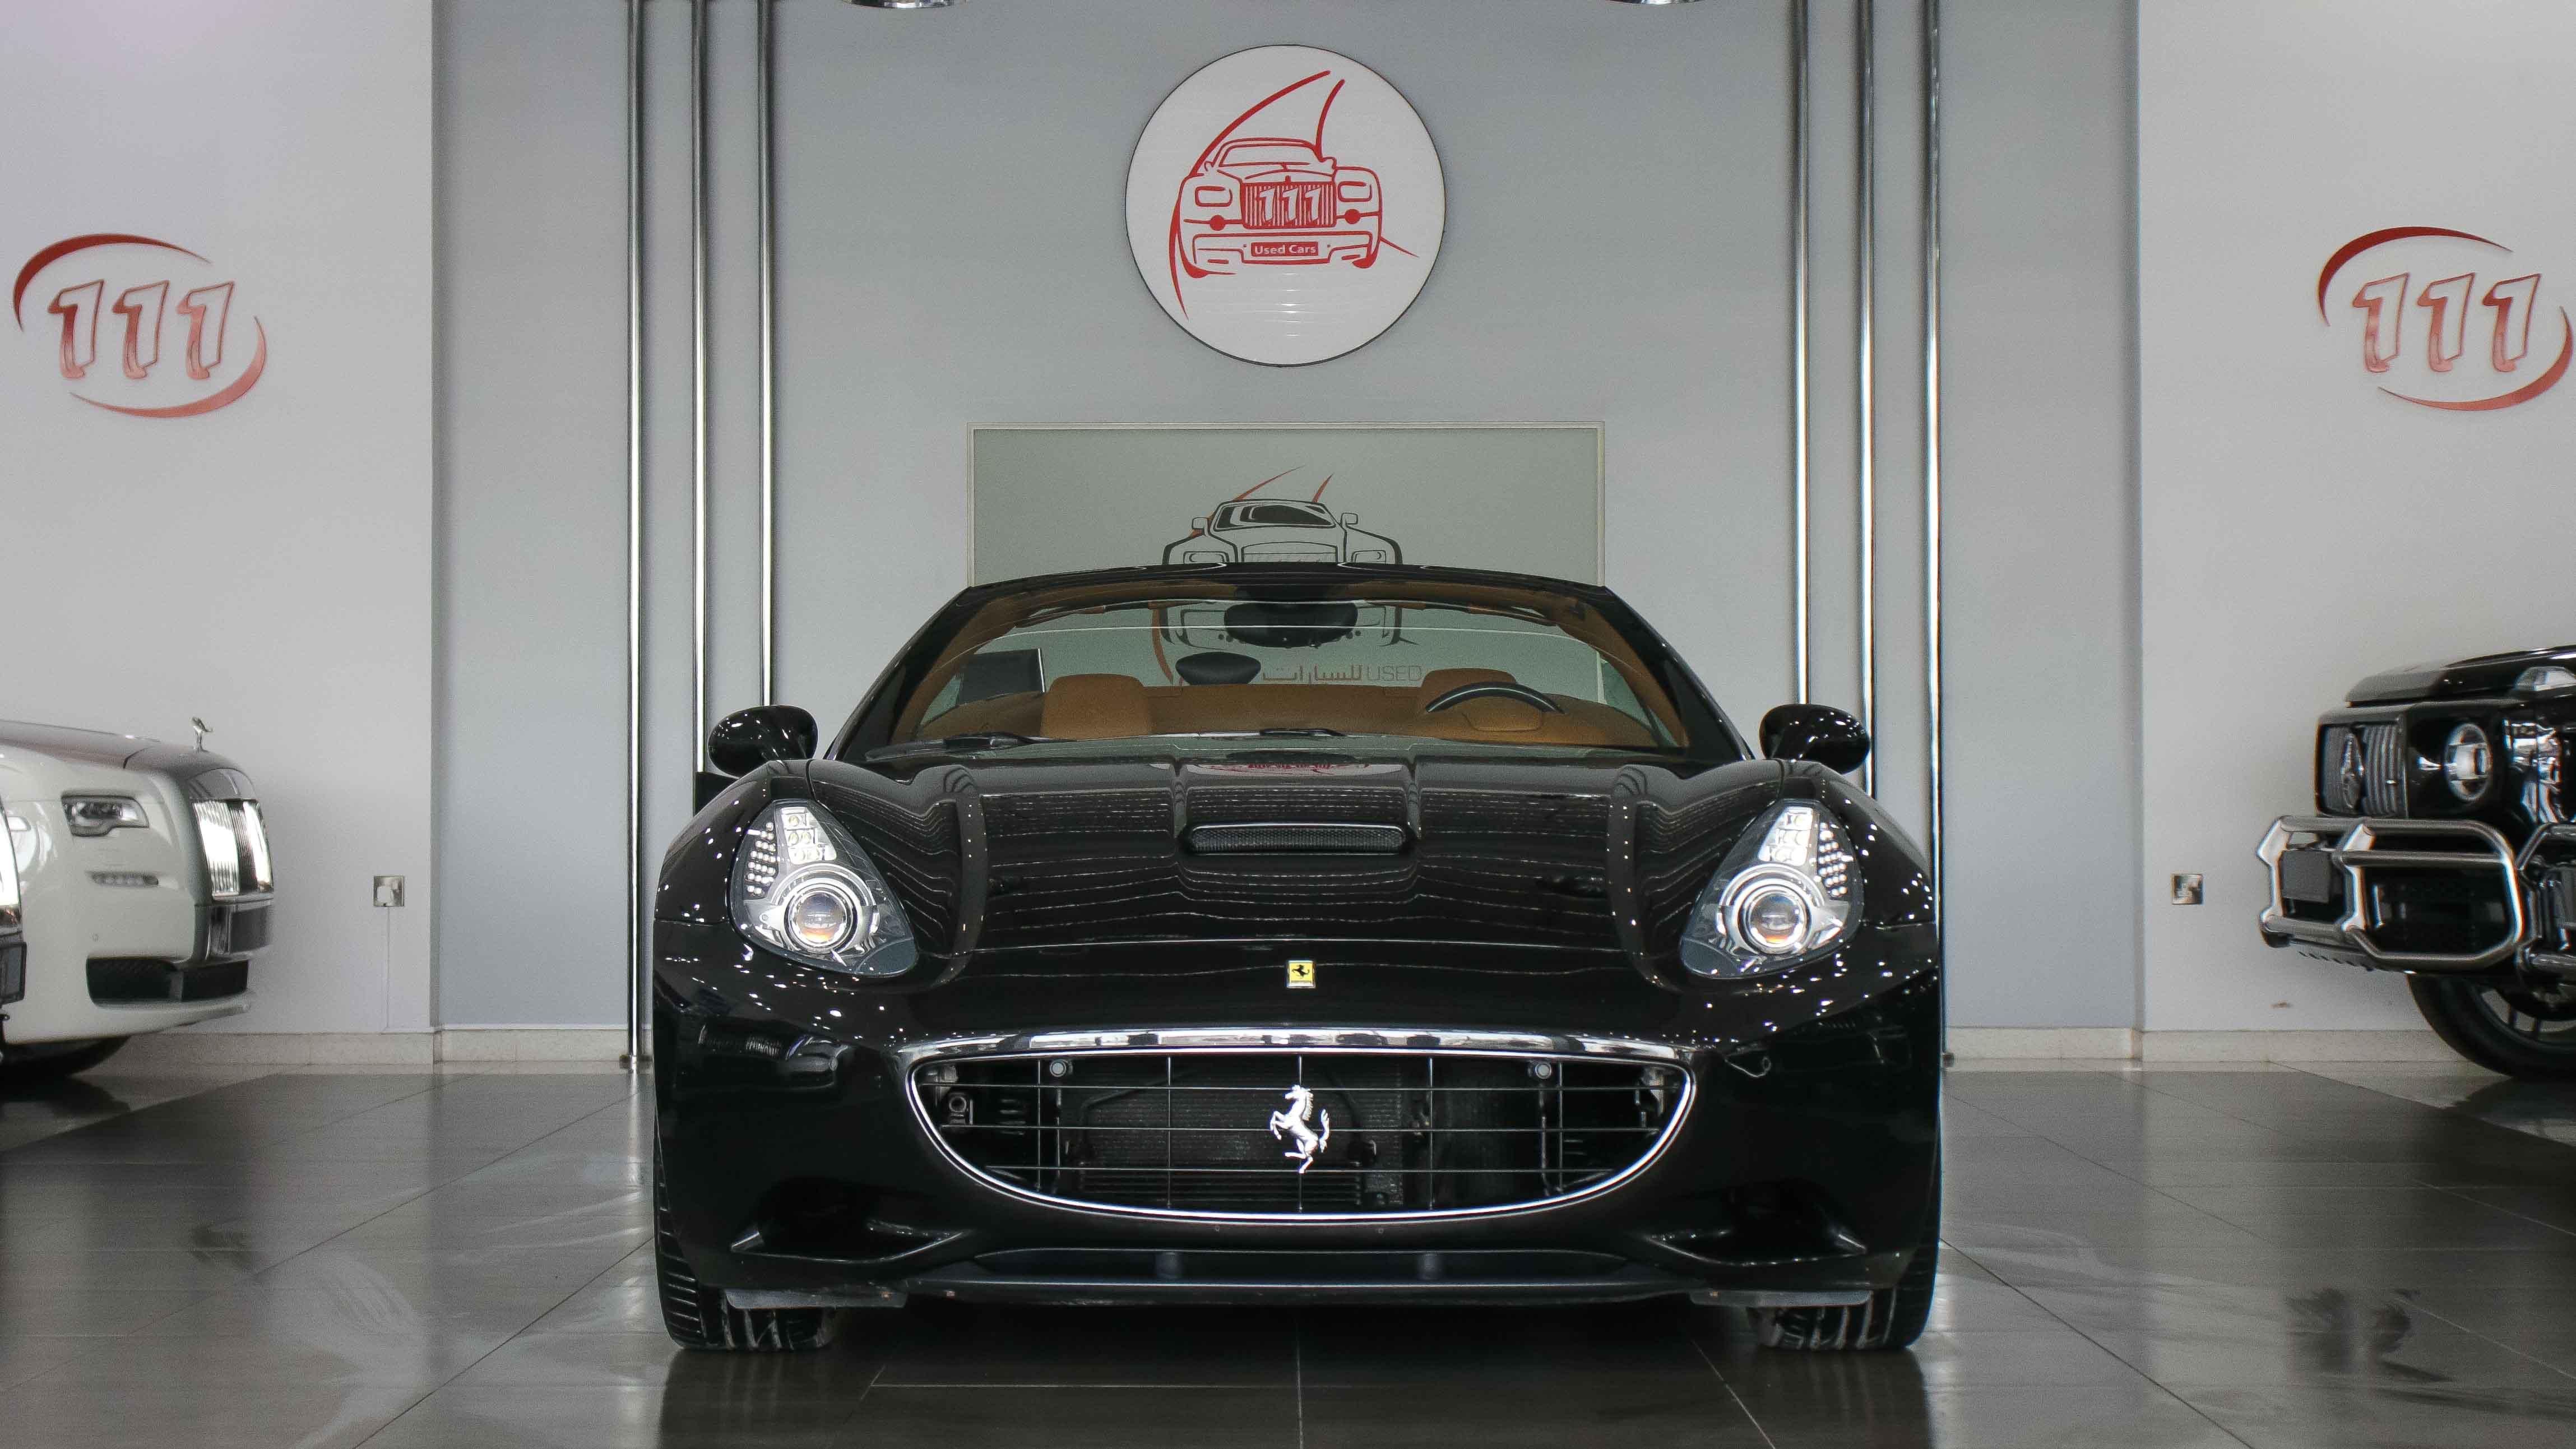 2010 Ferrari California Black Beige 02 Kargal Dealers Uae